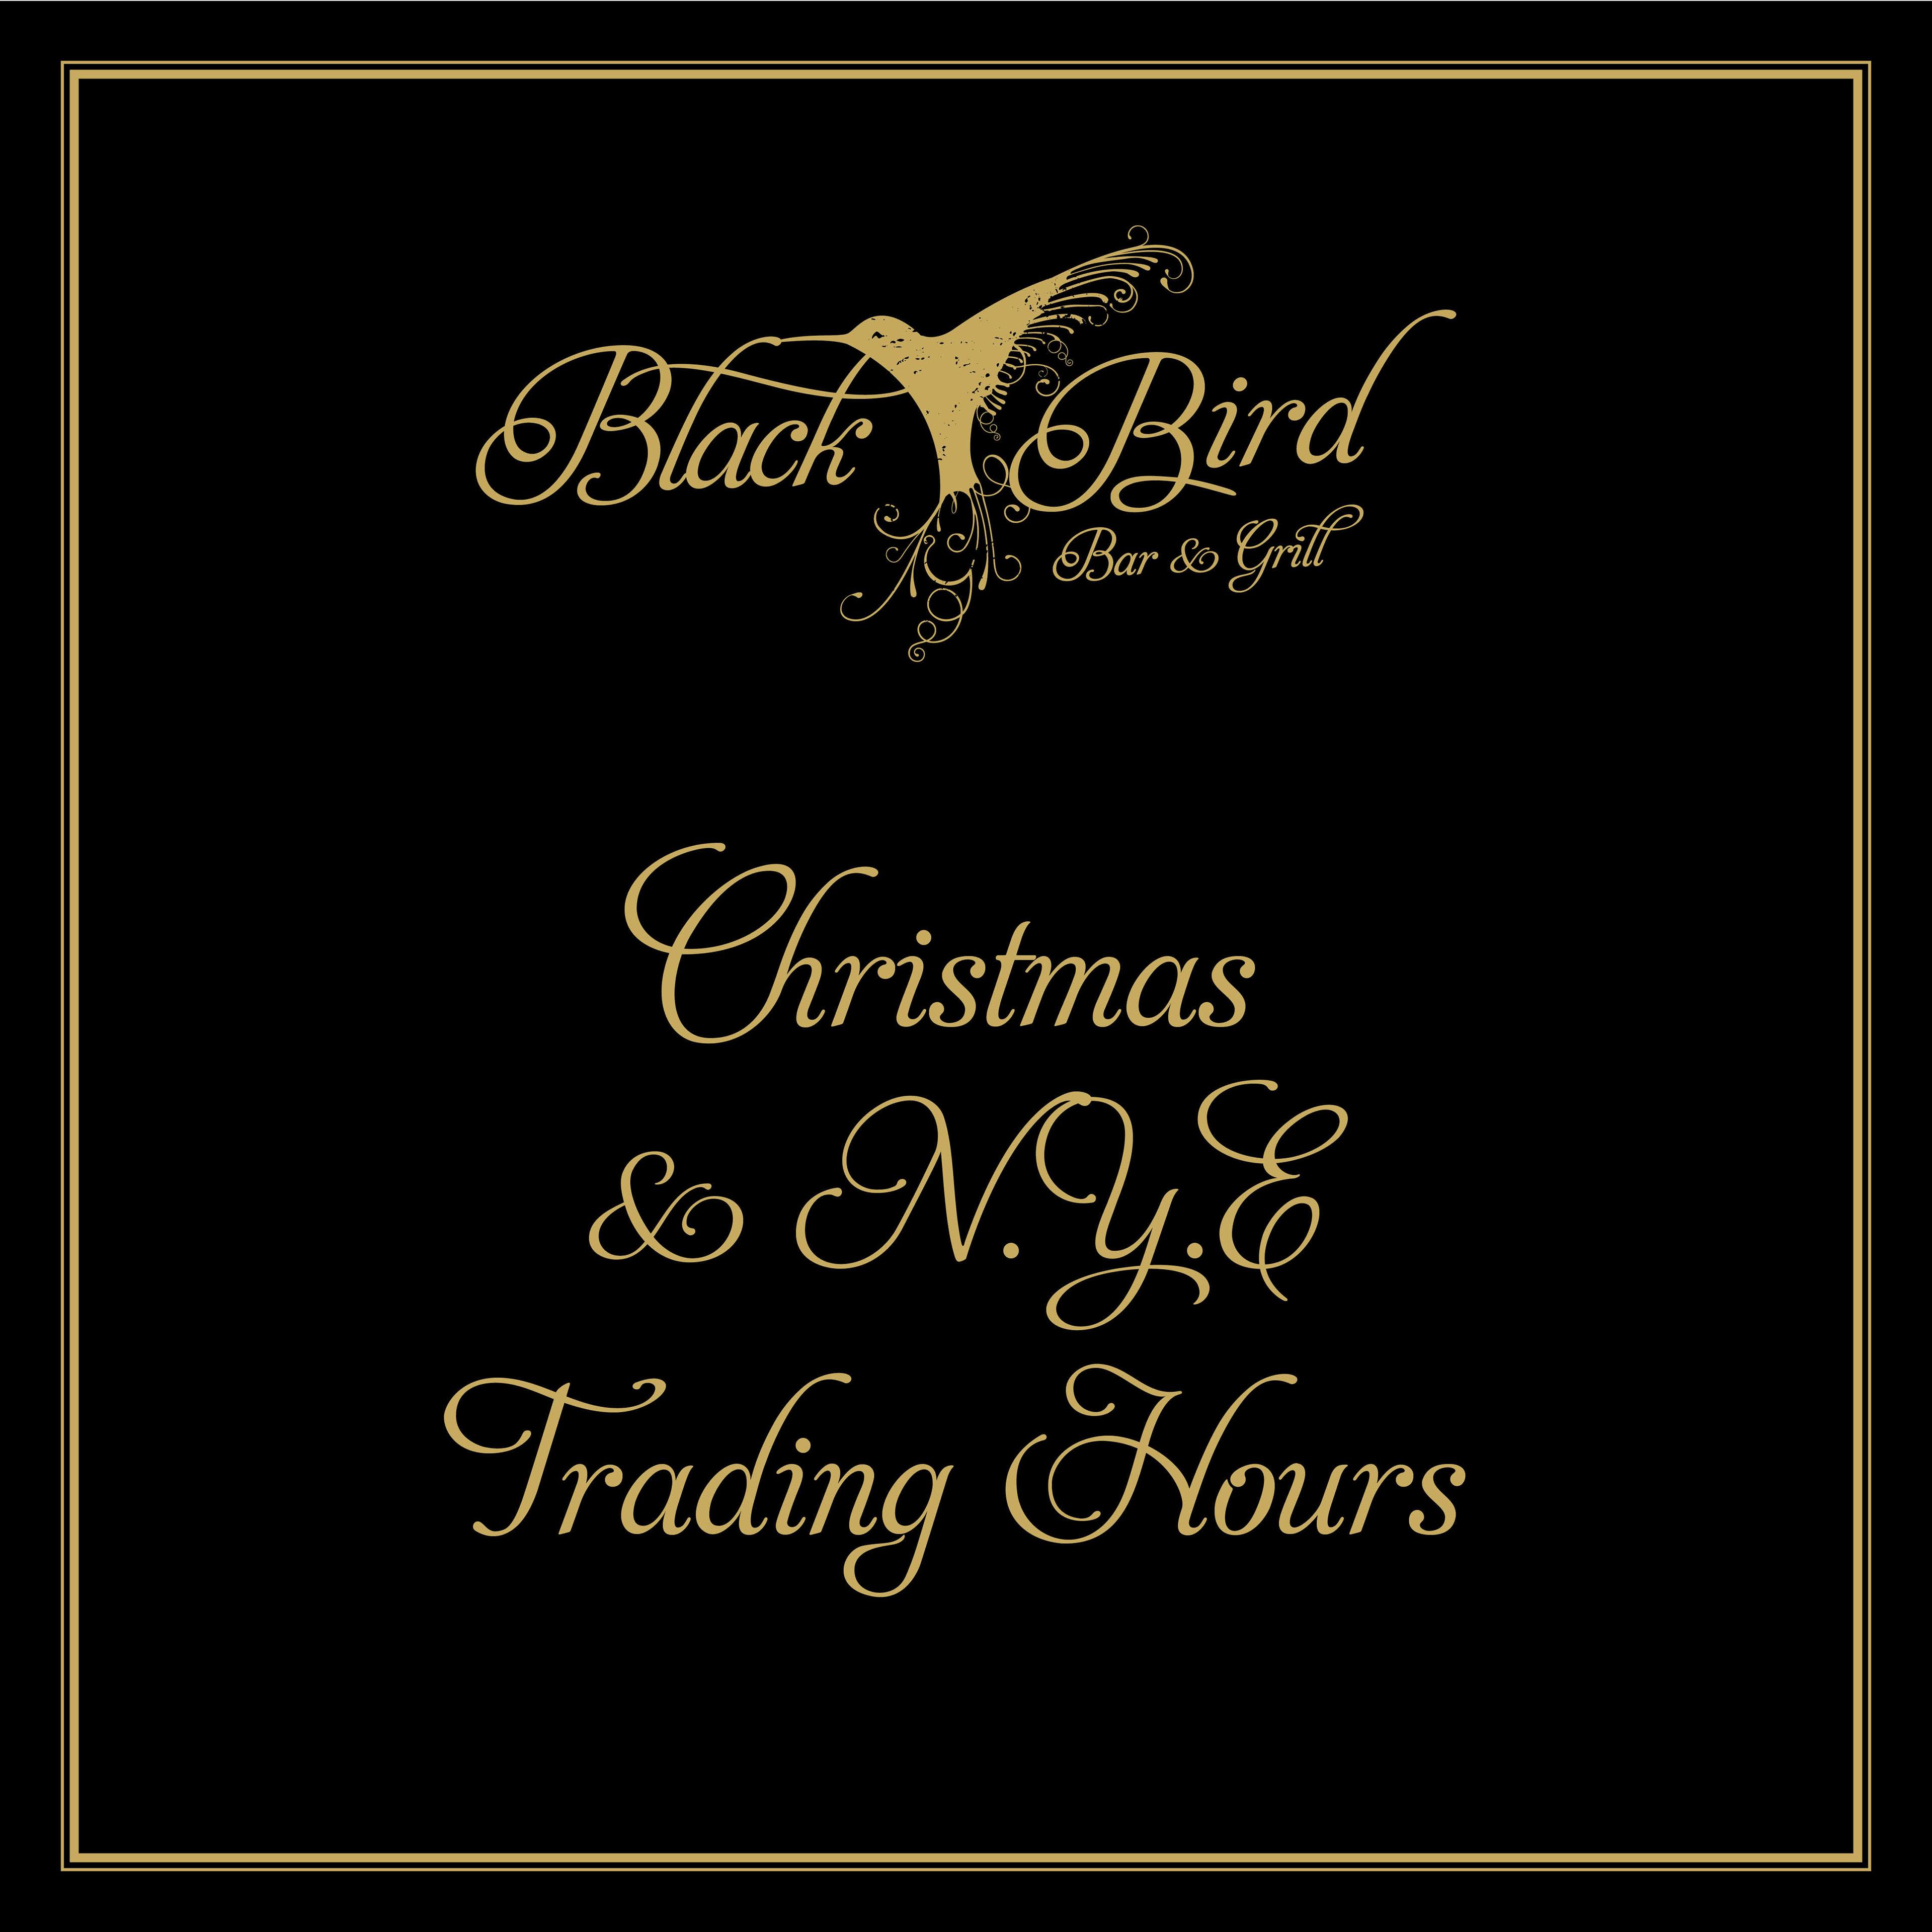 Jessica Carwardine - Black Bird